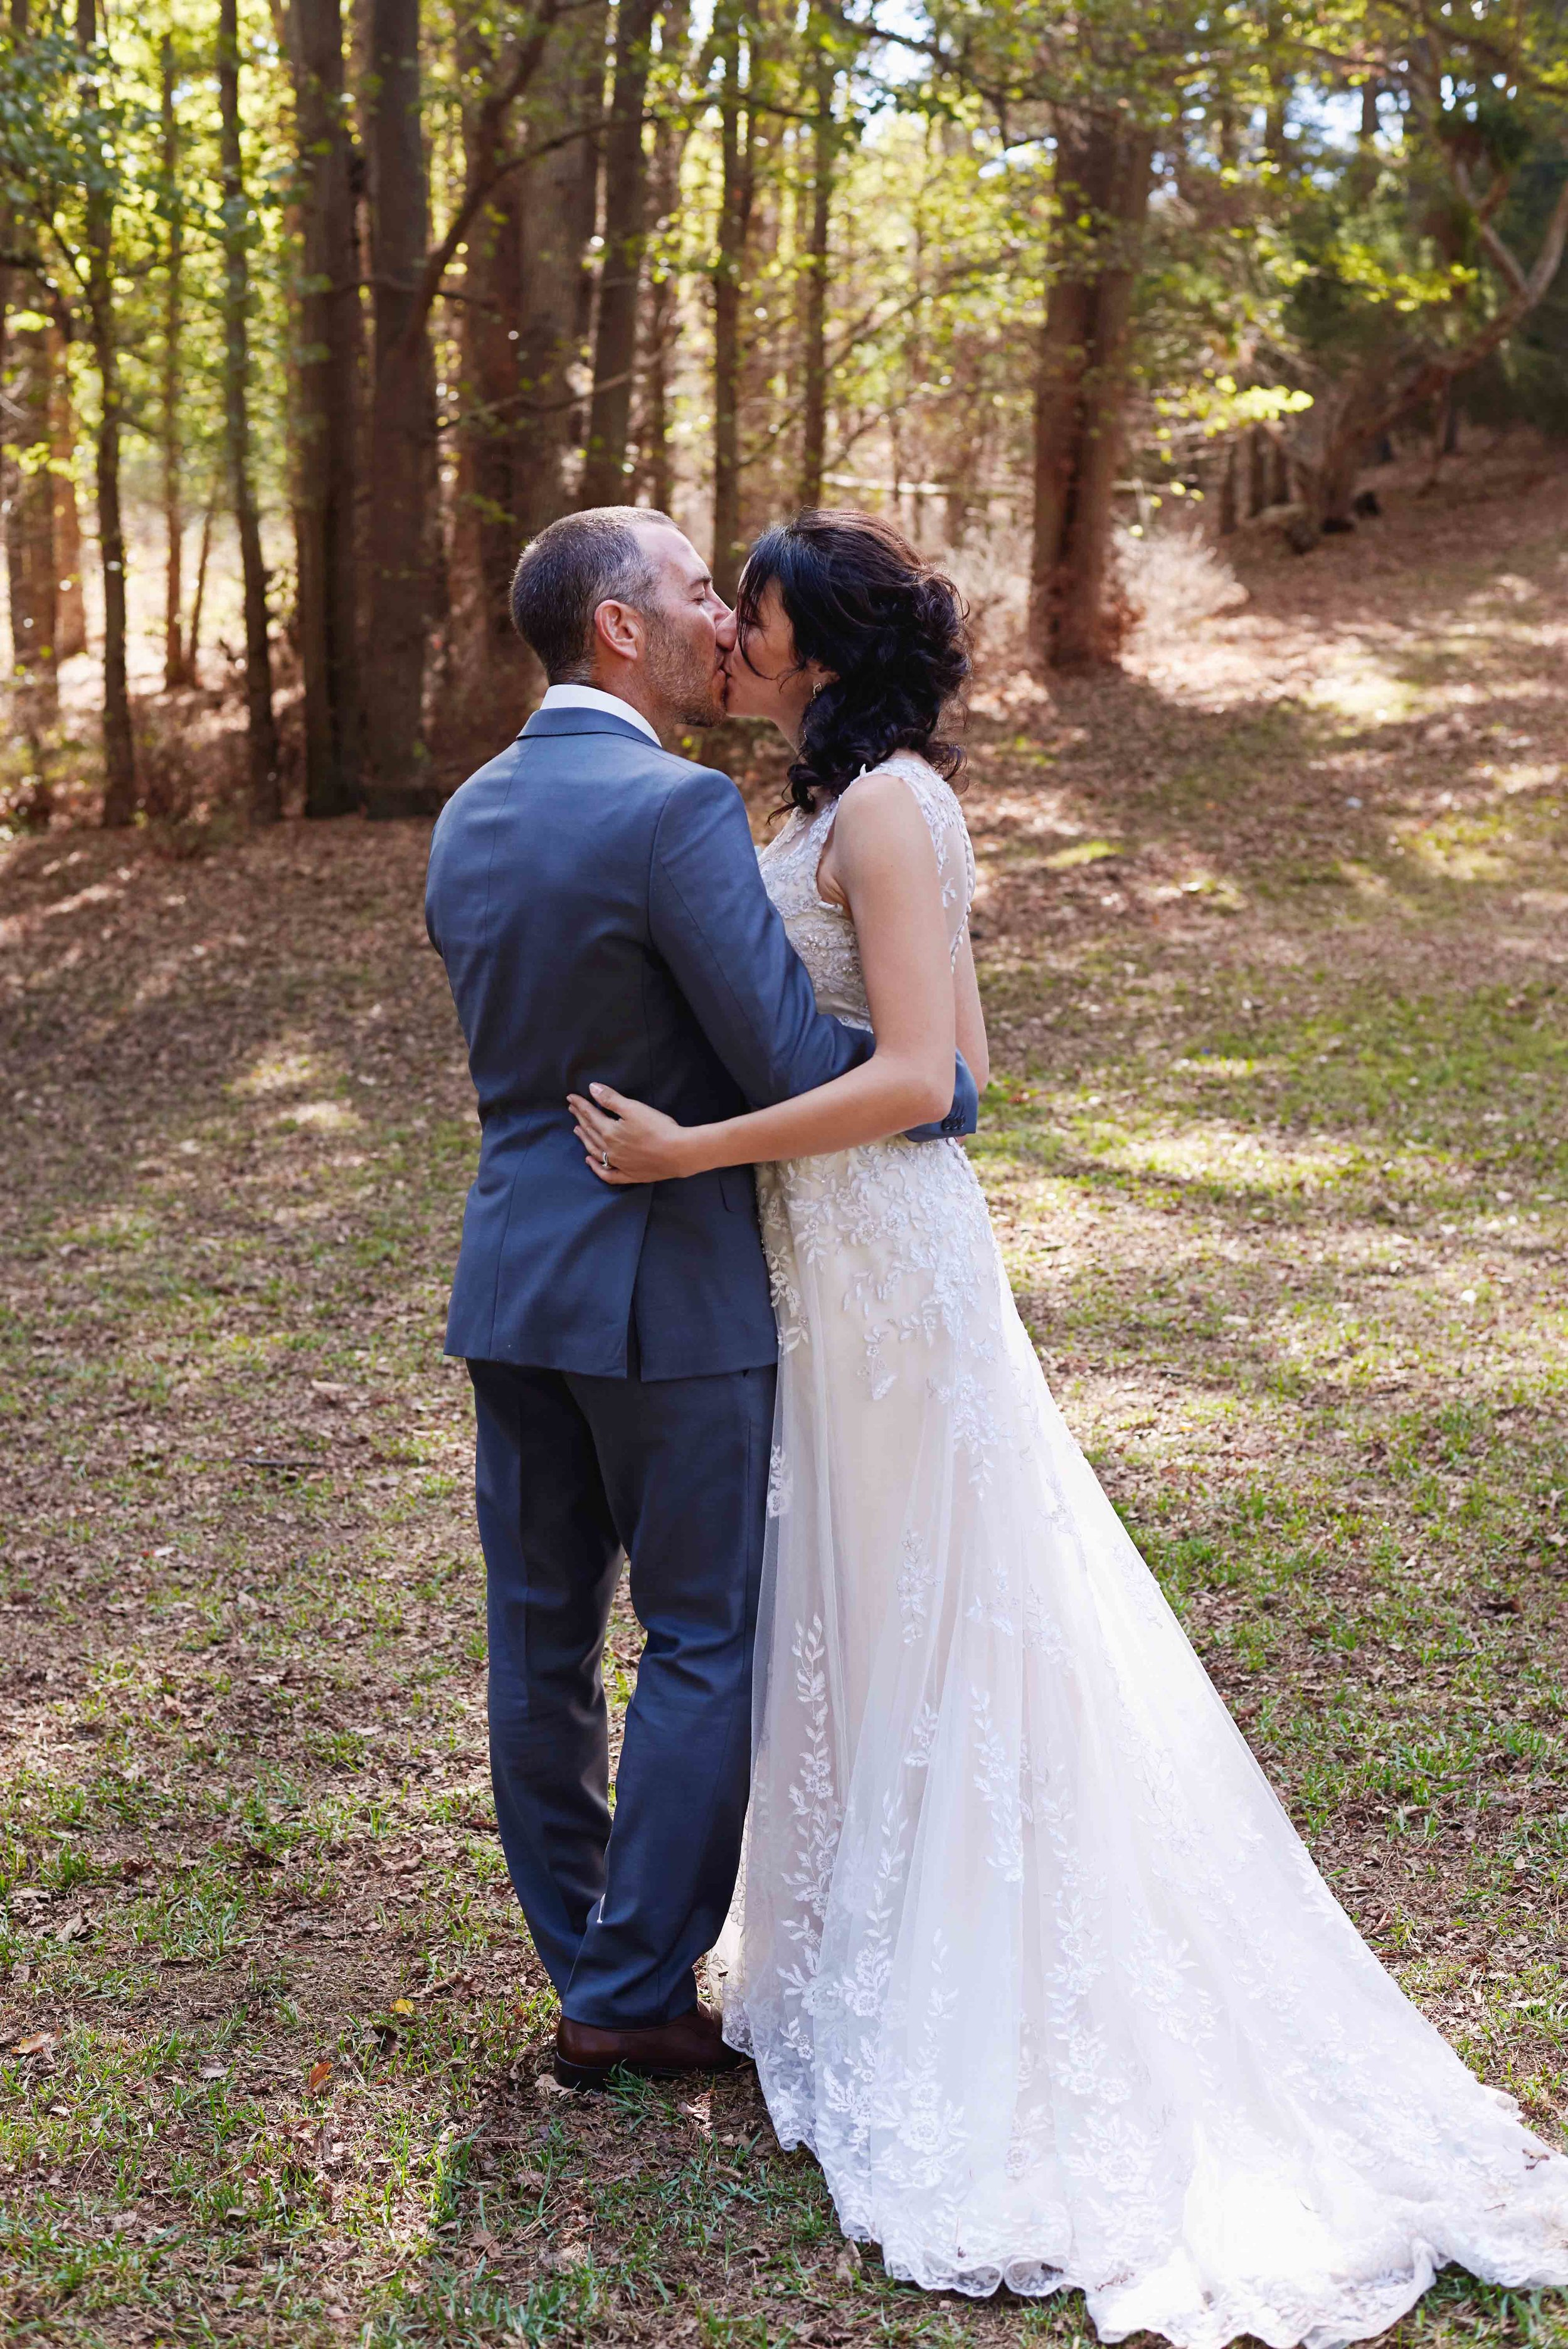 sorrento-wedding-photography-all-smiles-marissa-jade-photography-137.jpg